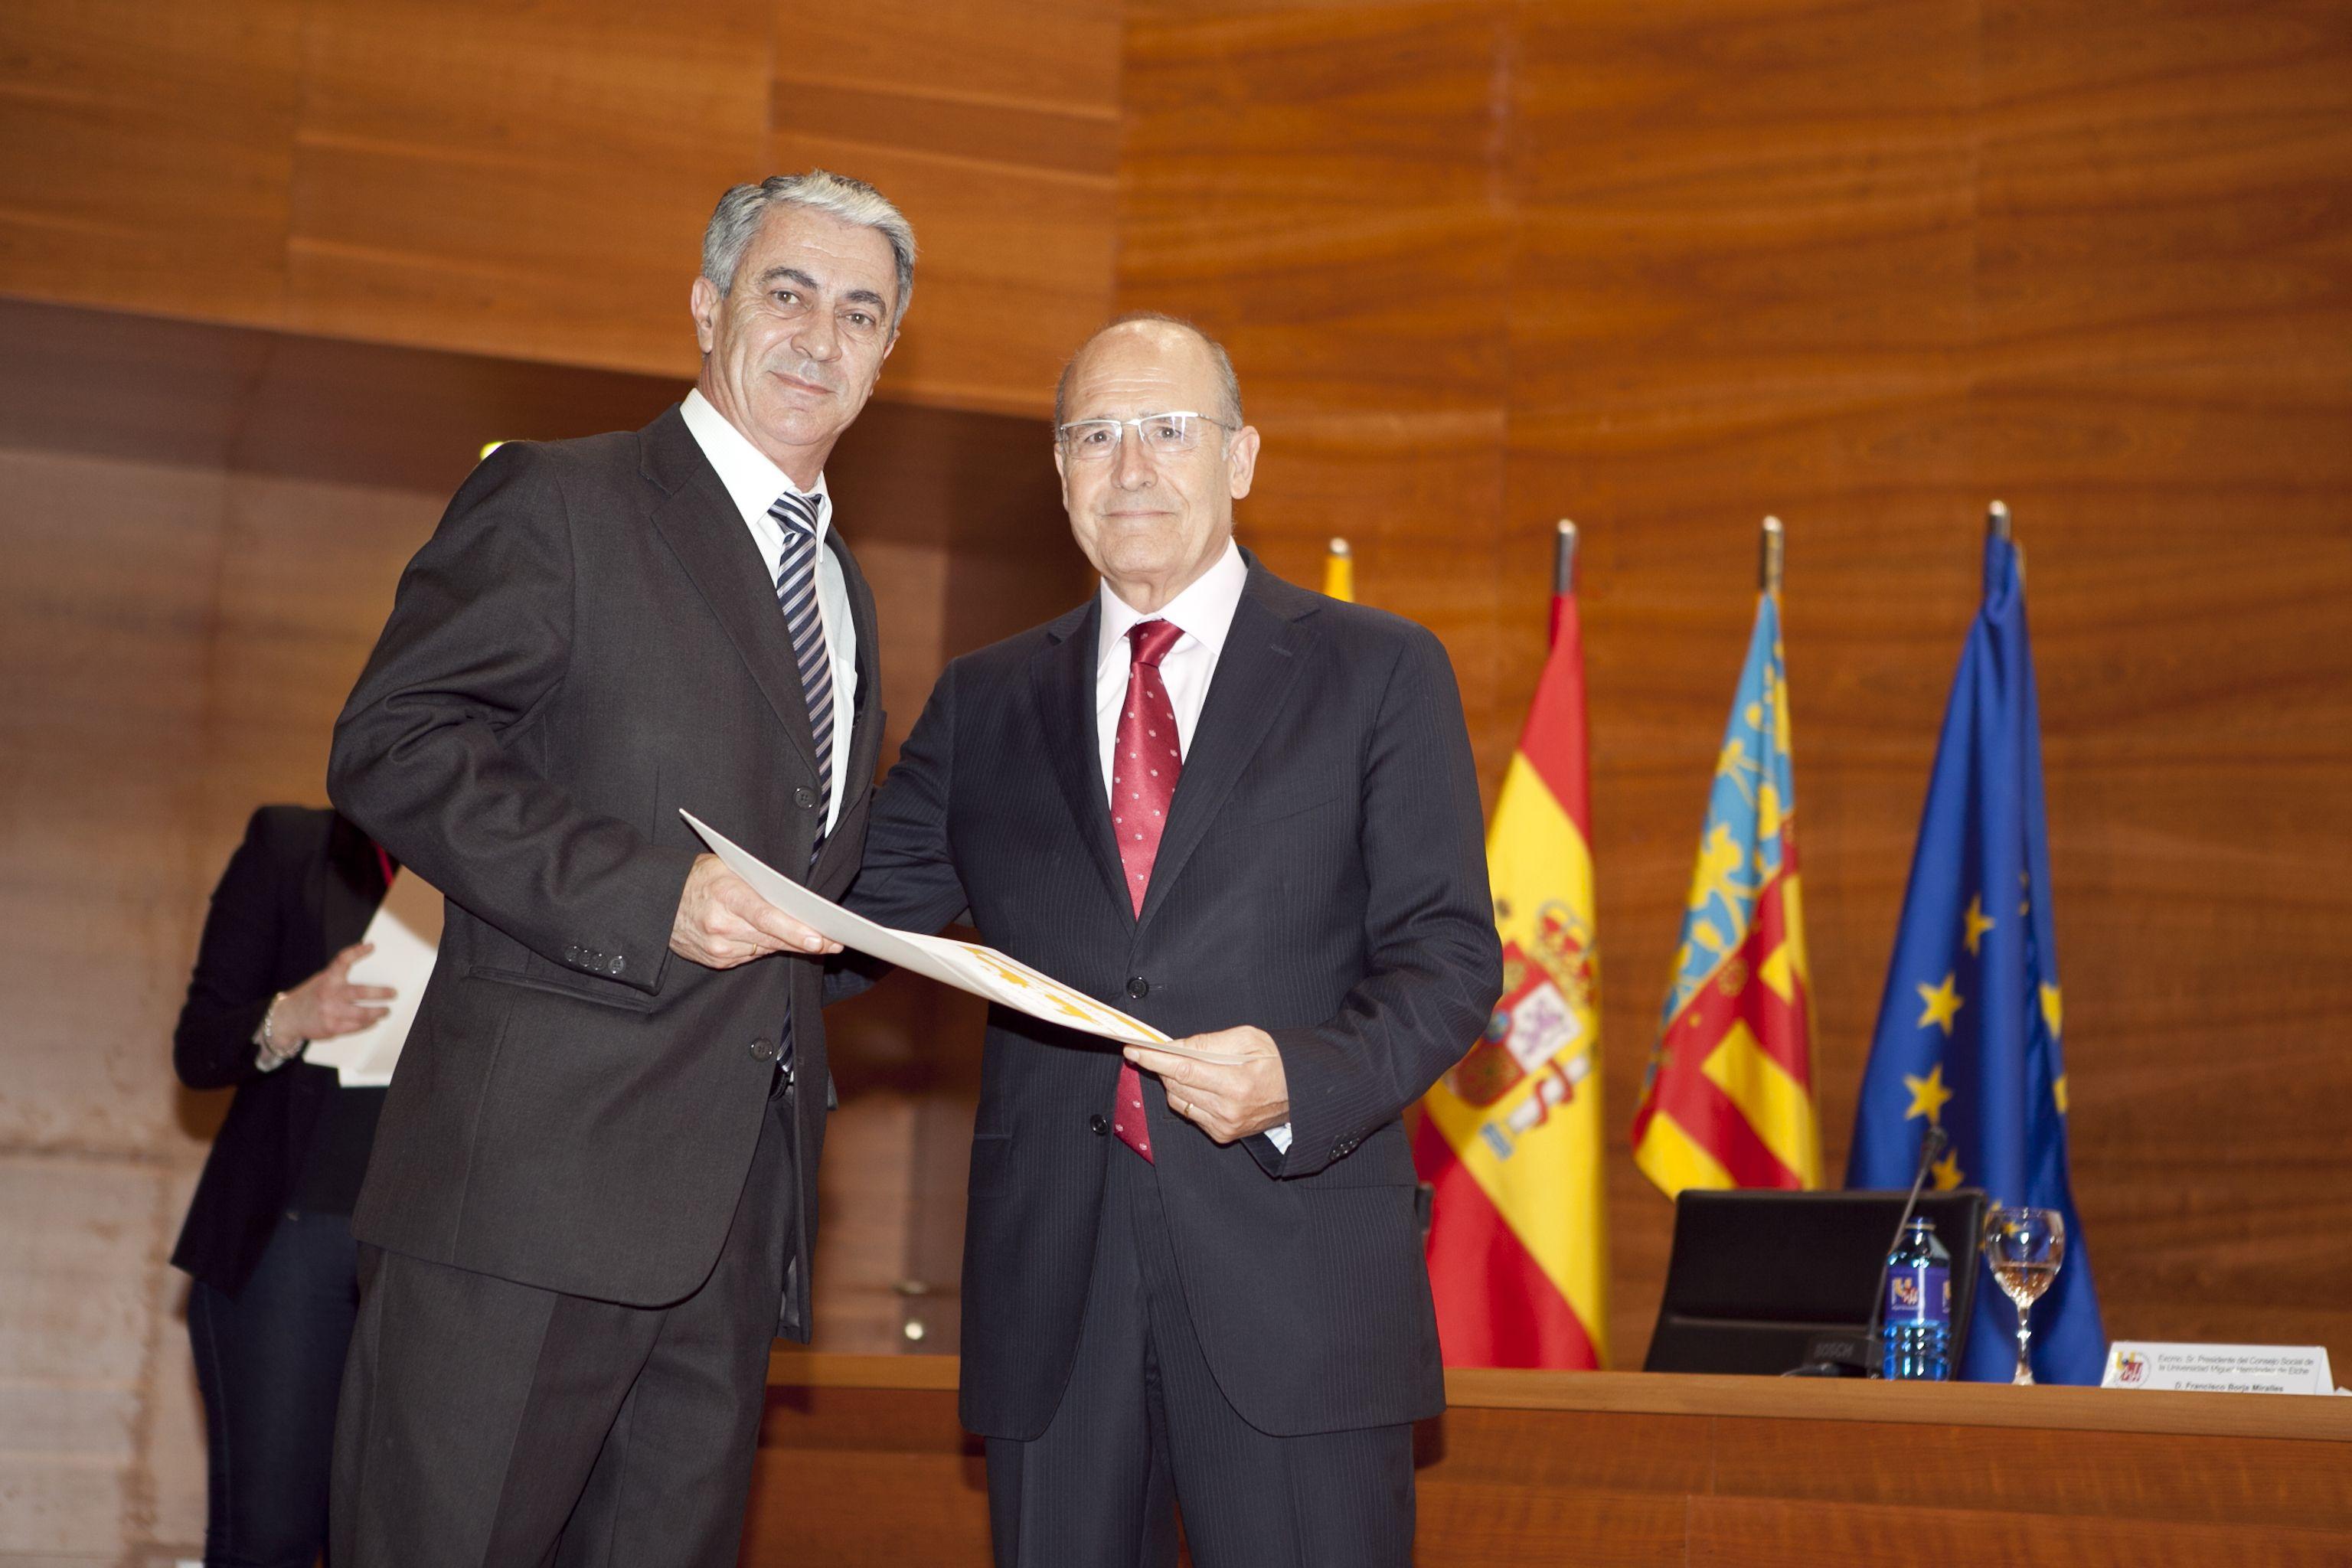 umh-diplomas-rector_mg_6889.jpg